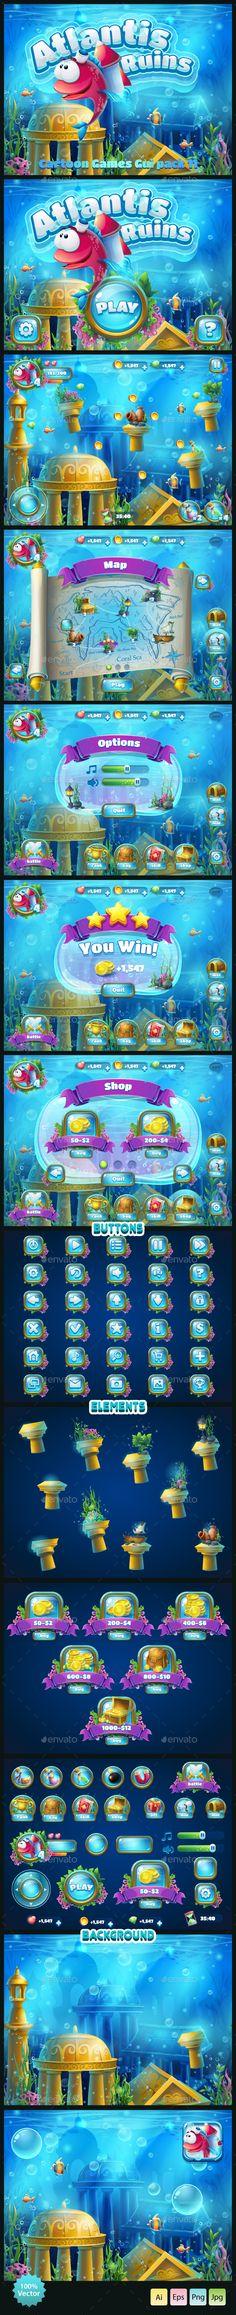 Atlantis Ruins GUI (User Interfaces)